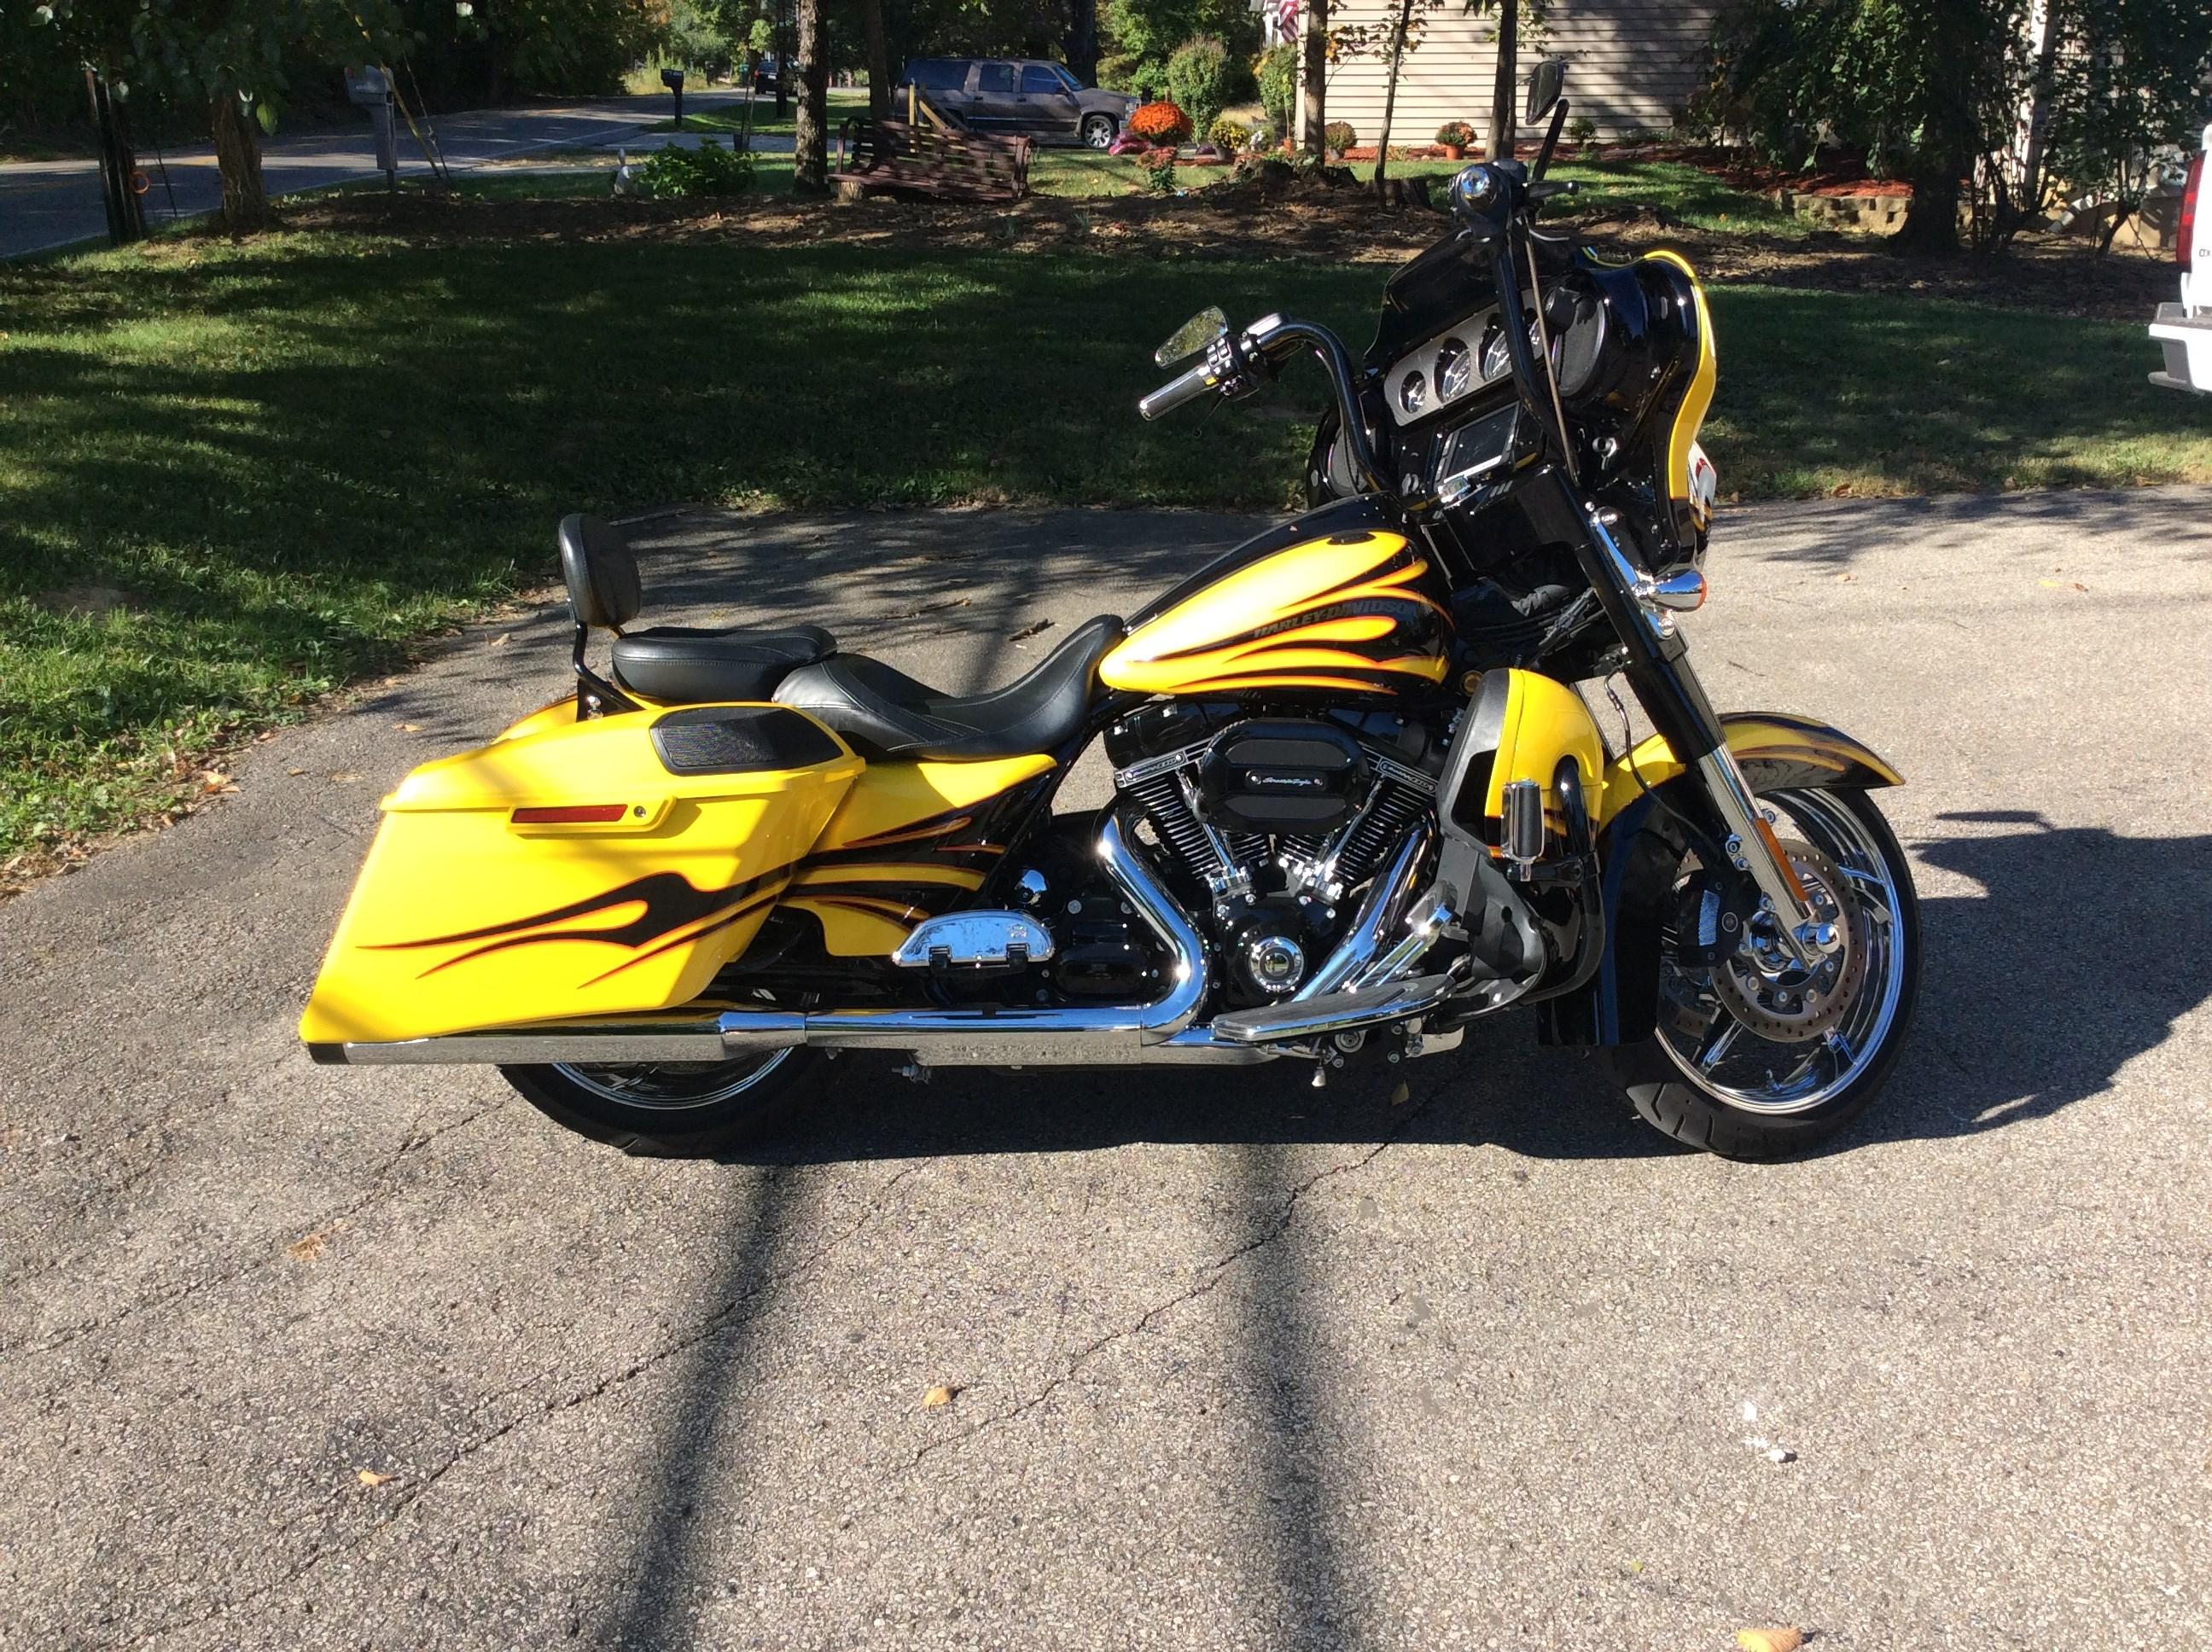 2015 harley davidson flhxse cvo street glide scorching yellow batavia ohio 674439. Black Bedroom Furniture Sets. Home Design Ideas